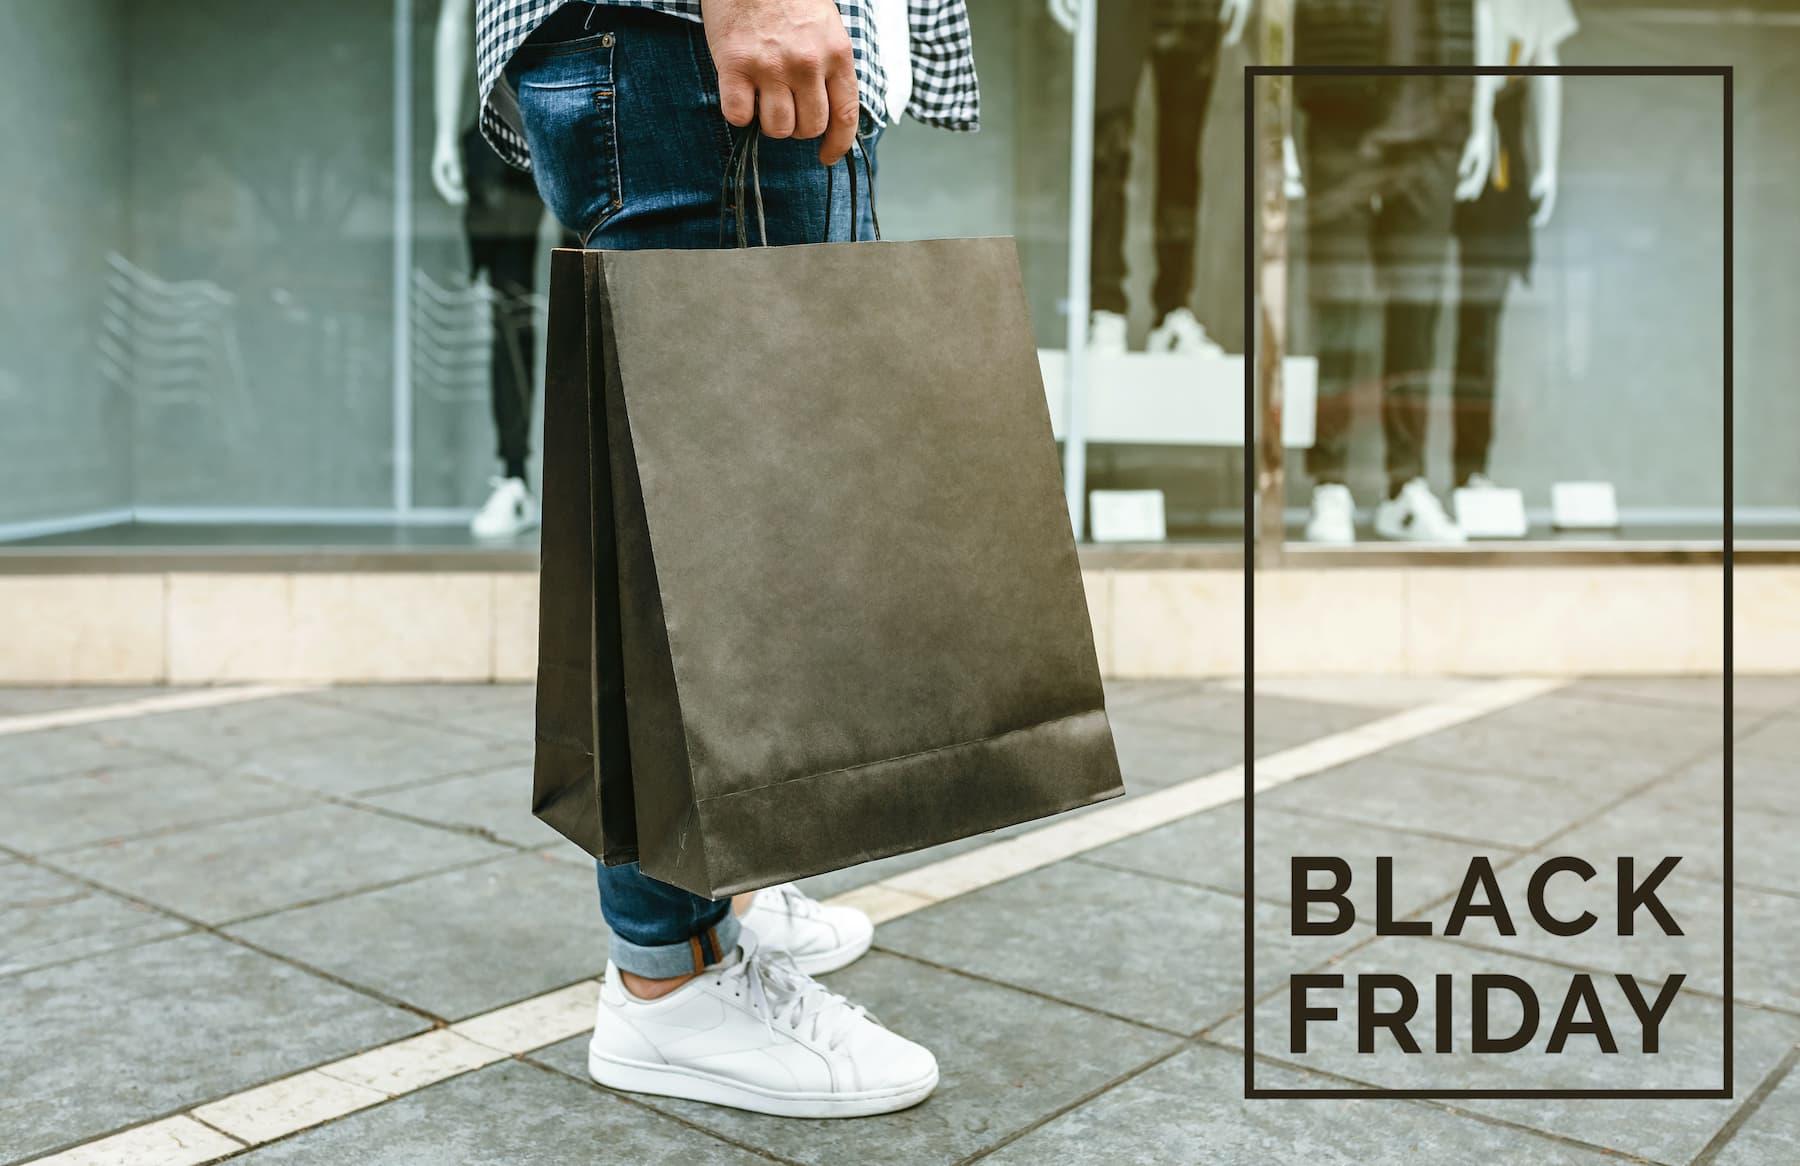 Sezonowy przegląd szafy: co warto kupić na Black Friday?